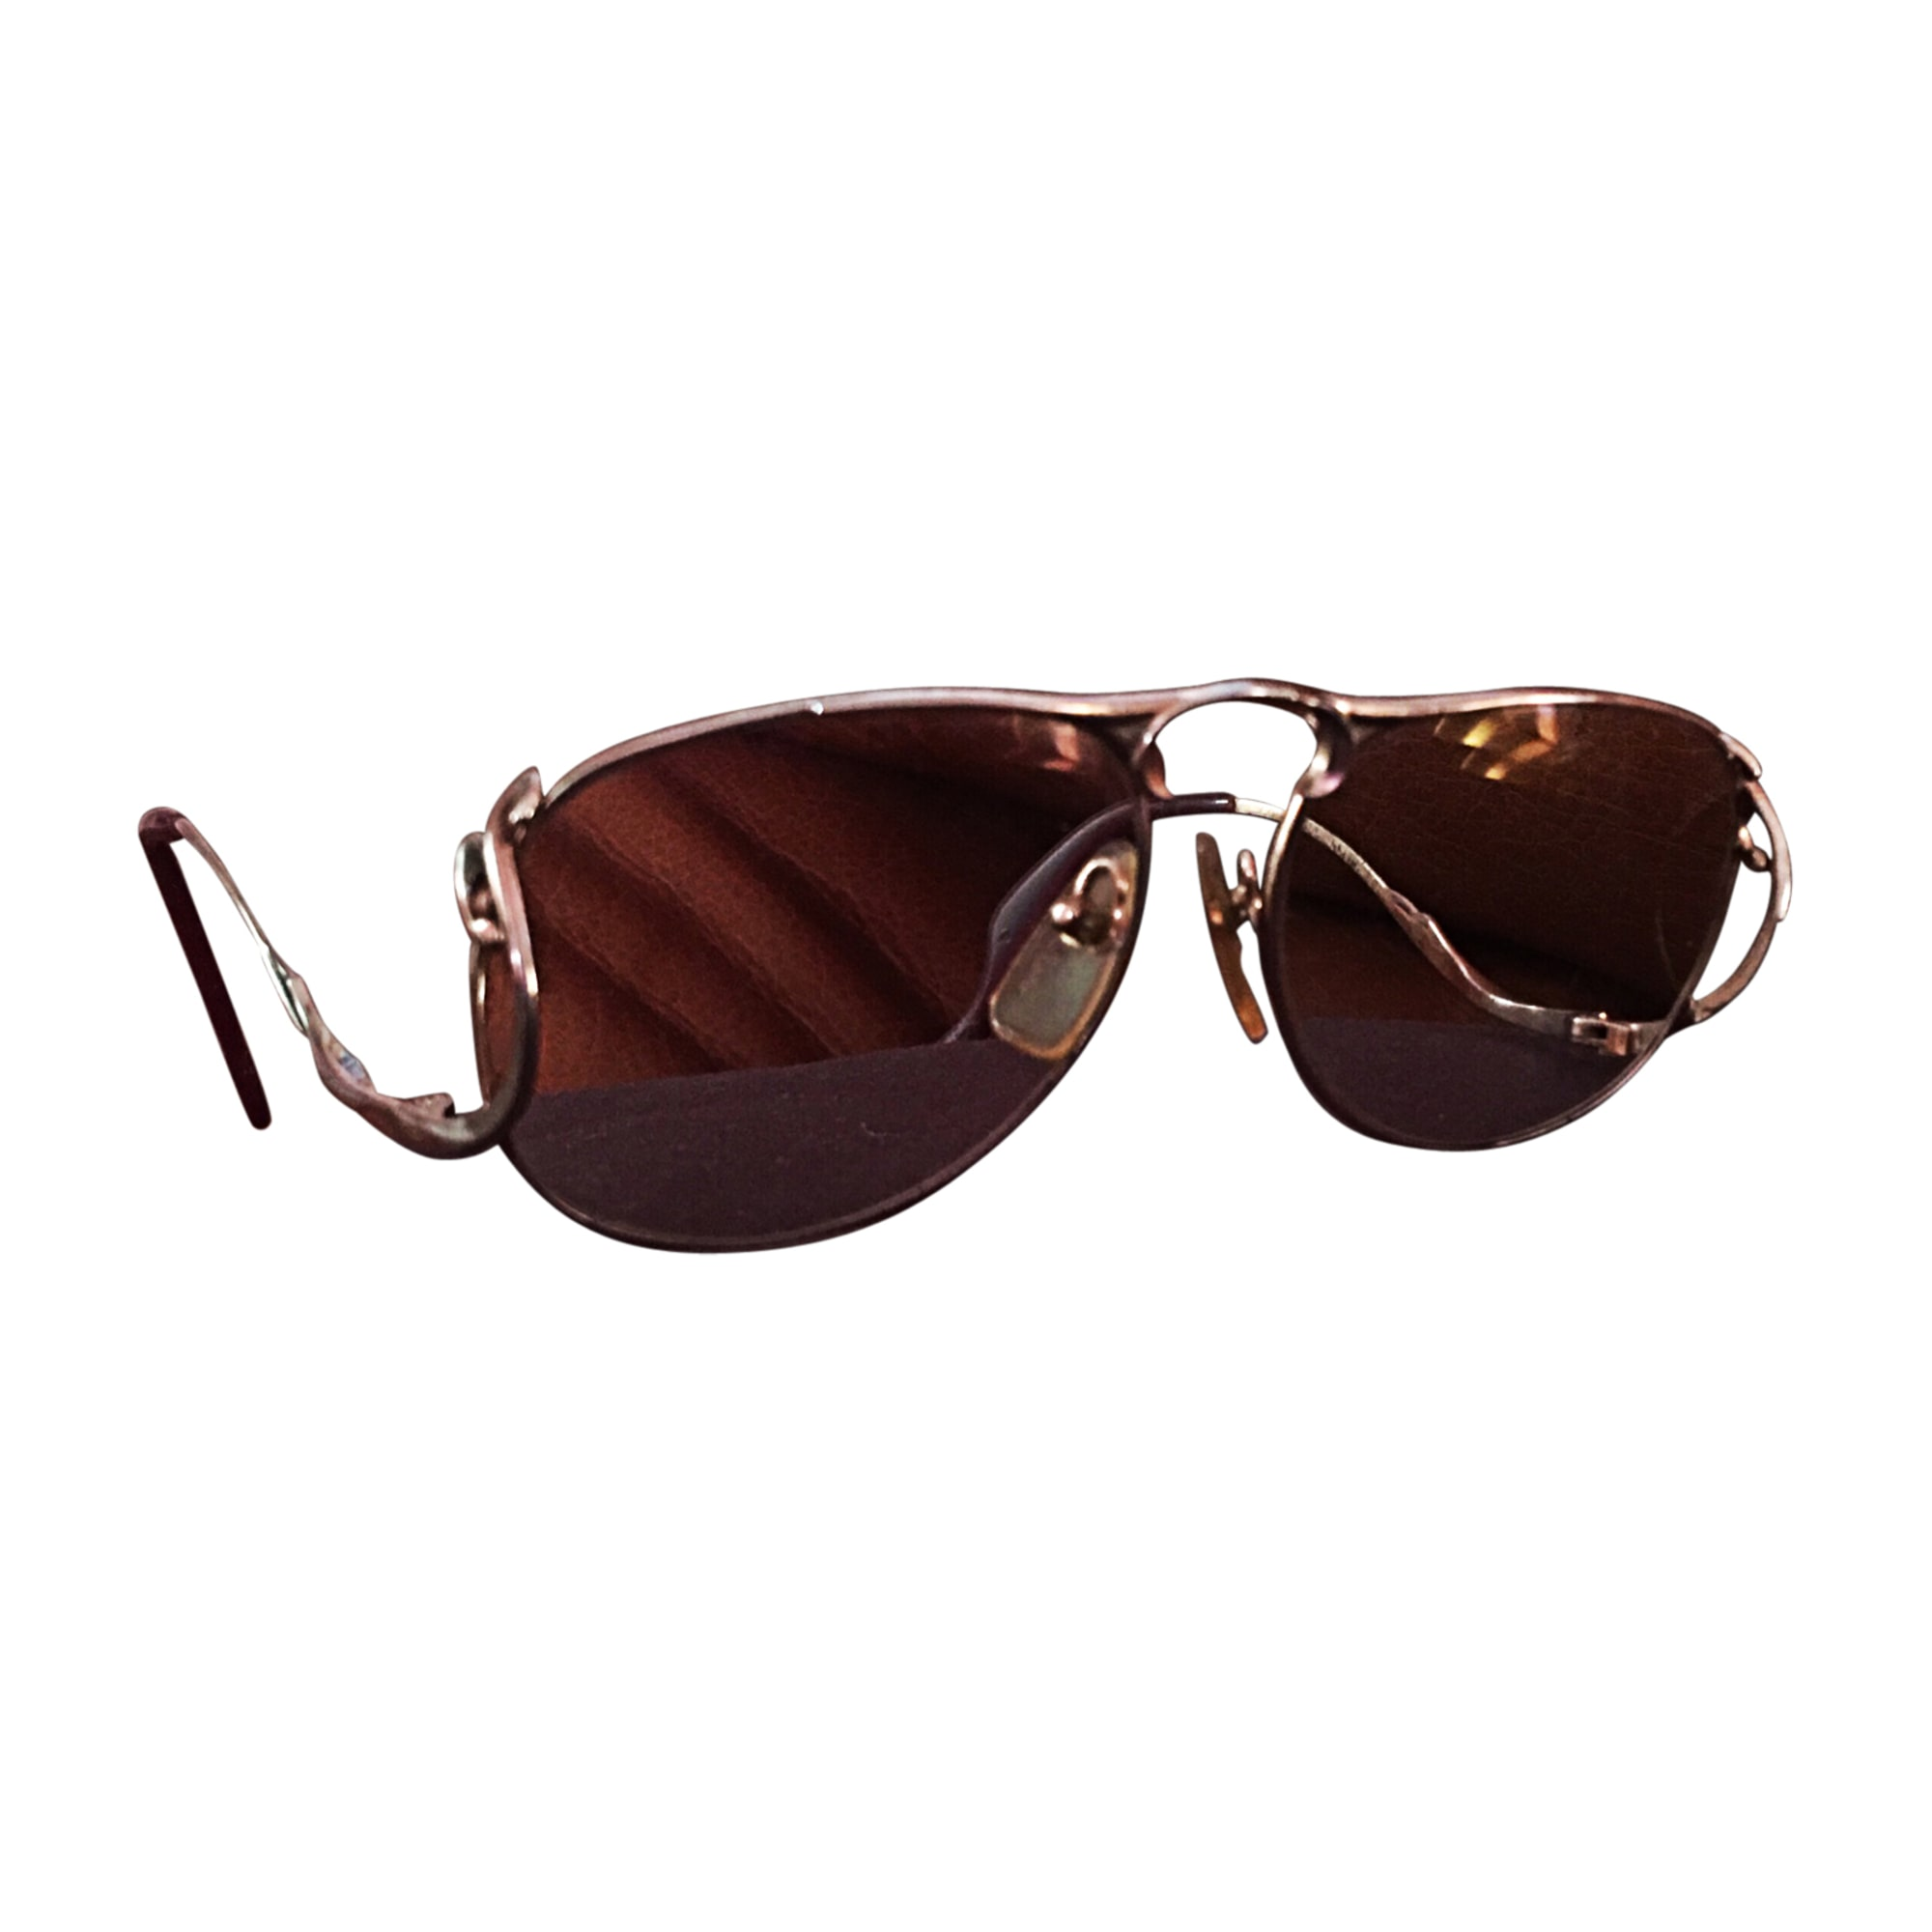 Eyeglass Frames ST DUPONT Golden, bronze, copper